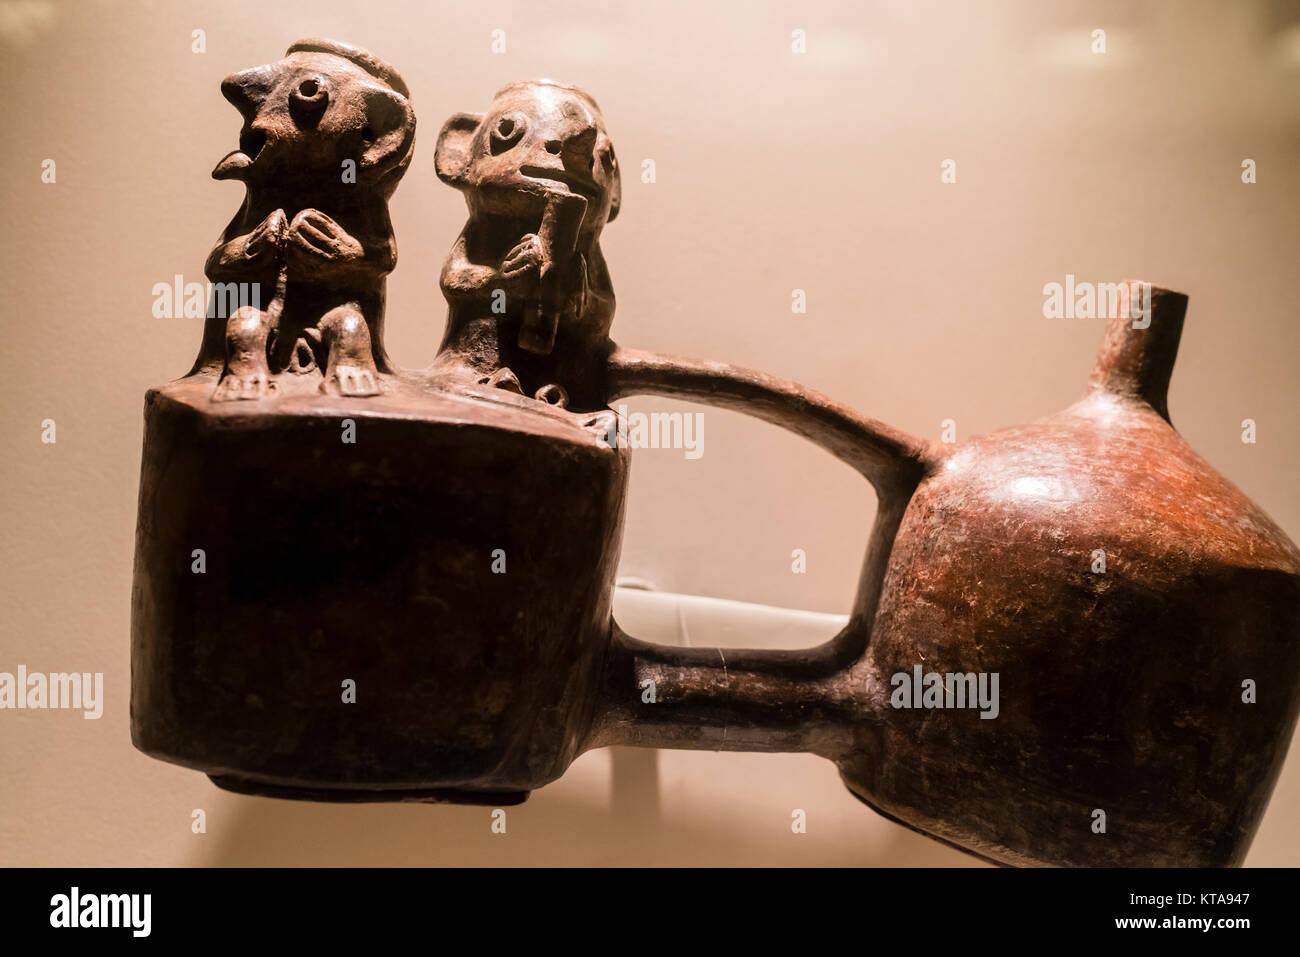 Ceramic vessel Vicús culture 100 BC-400 AC Perú - Stock Image